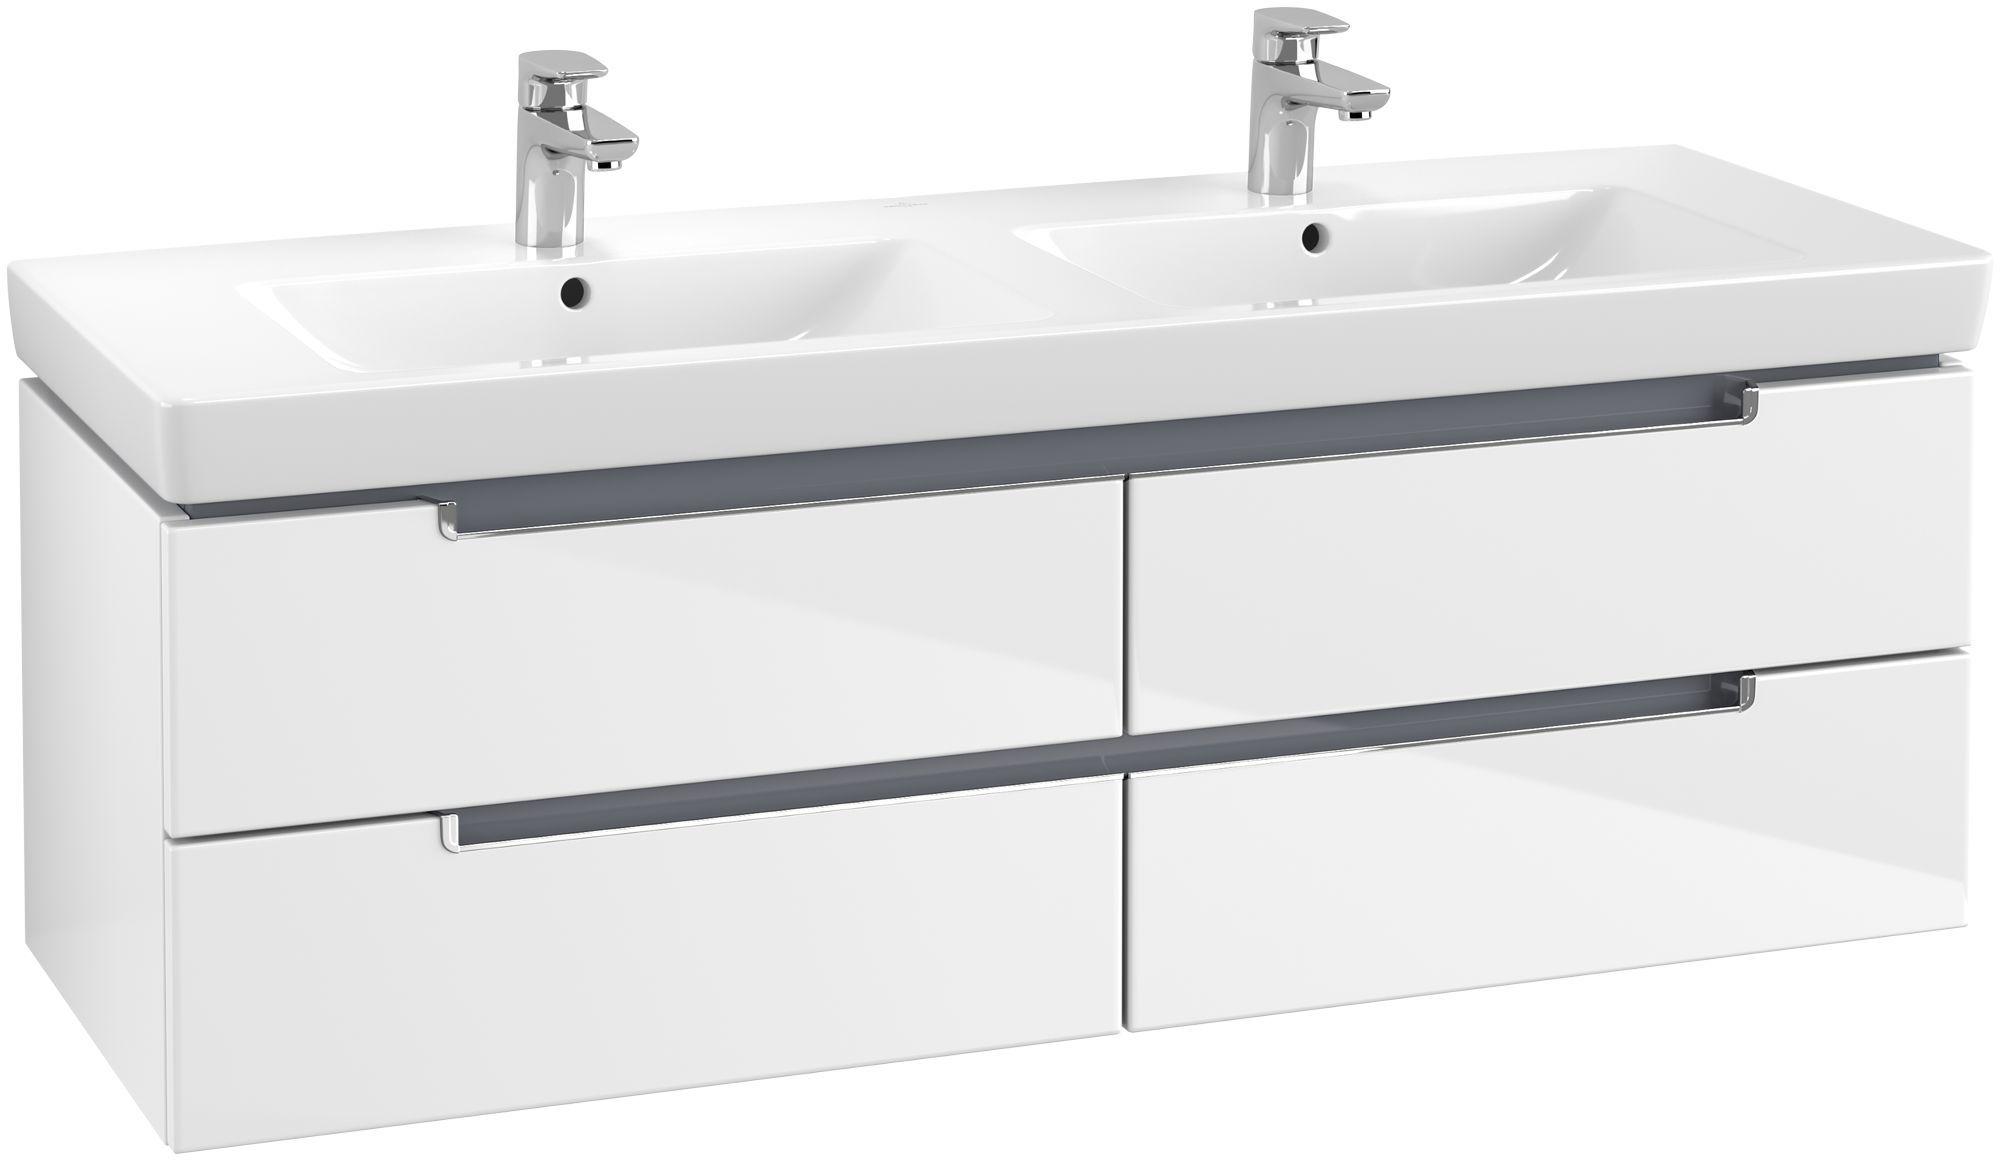 Villeroy & Boch Subway 2.0 Waschtischunterschrank 4 Auszüge B:1287xT:449xH:420mm glossy weiß Griffe chrom A69210DH